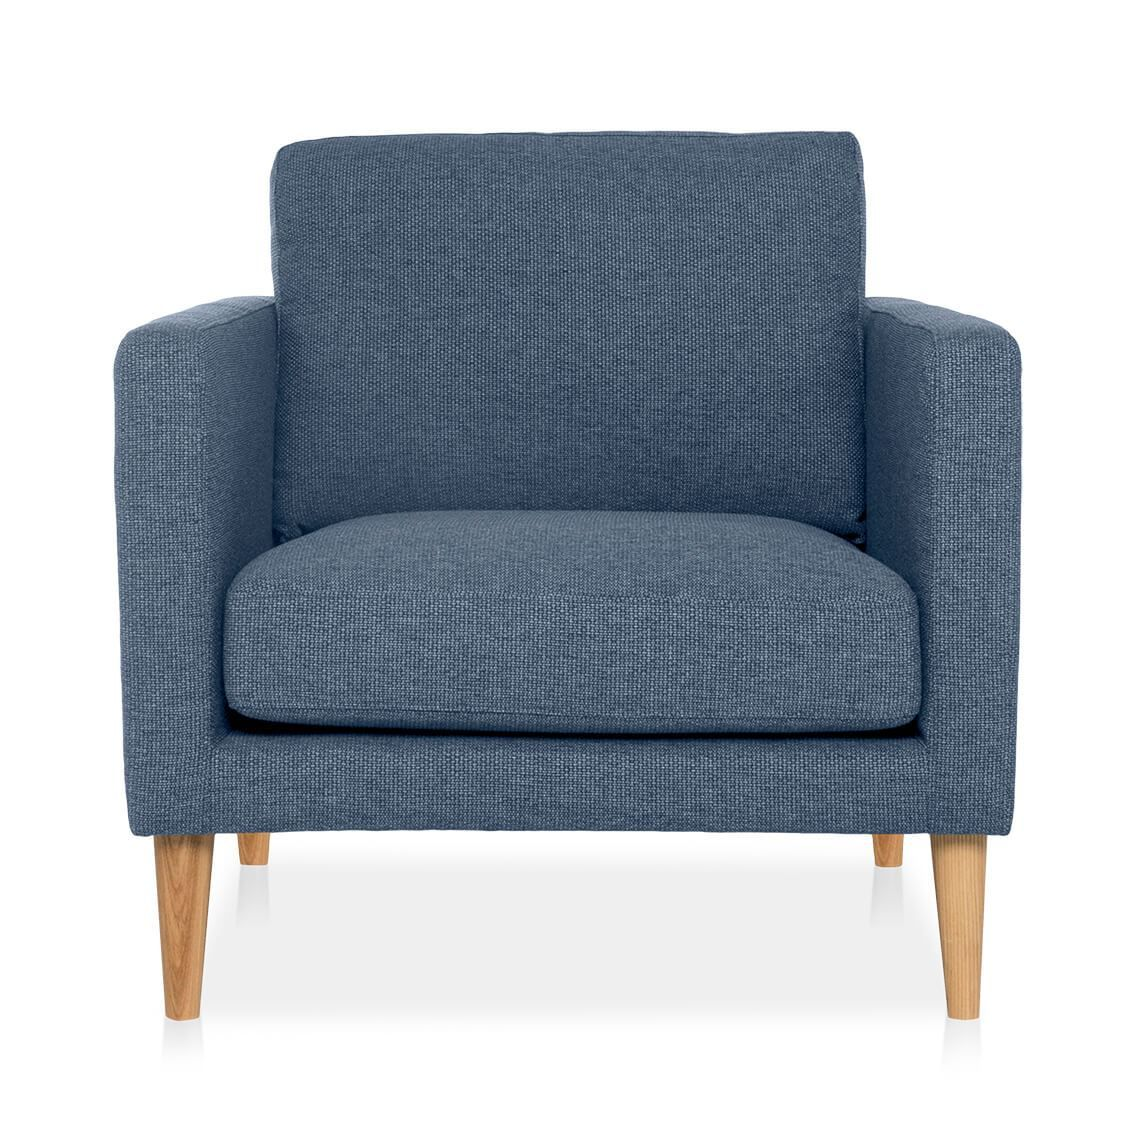 Docklands Fabric Armchair Fabric Armchairs Furniture Armchair